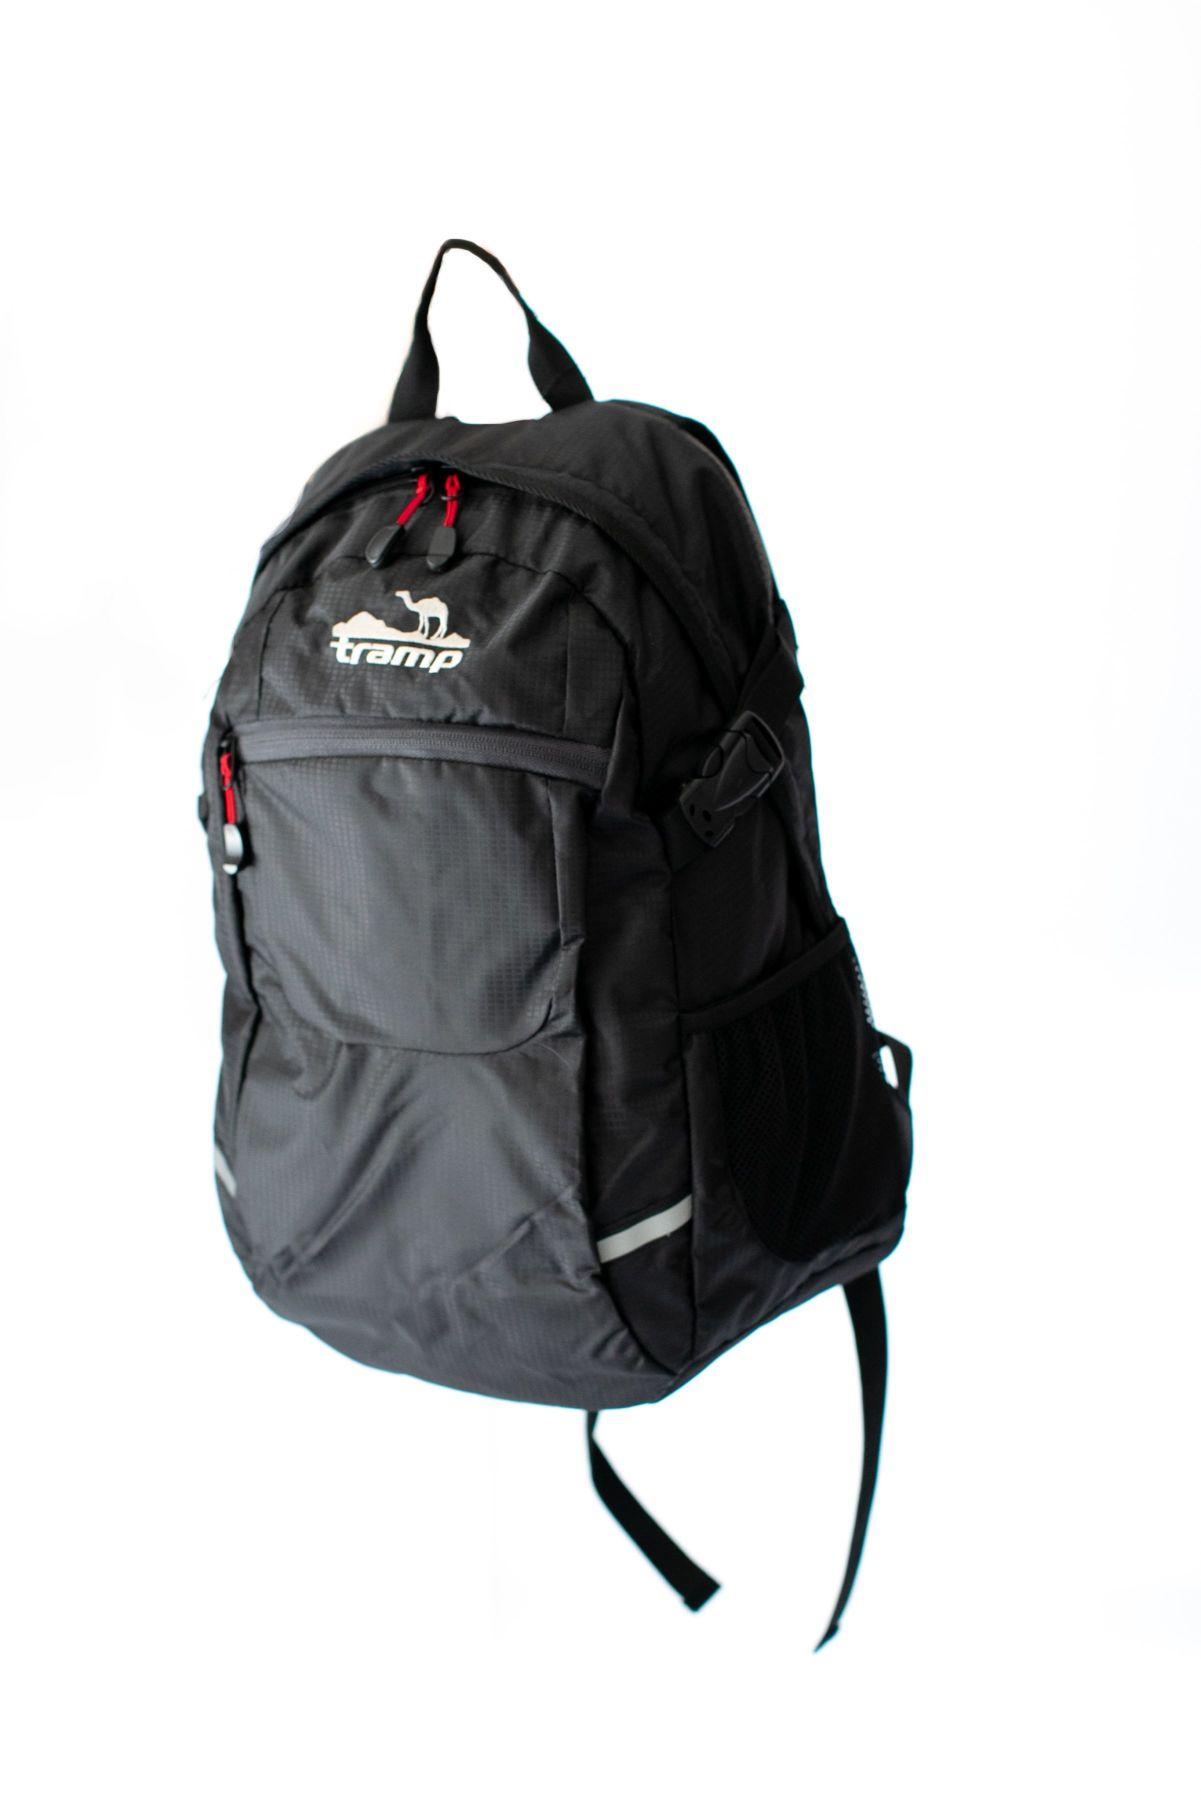 Рюкзак Tramp Slash TRP-036-black 28 л черный